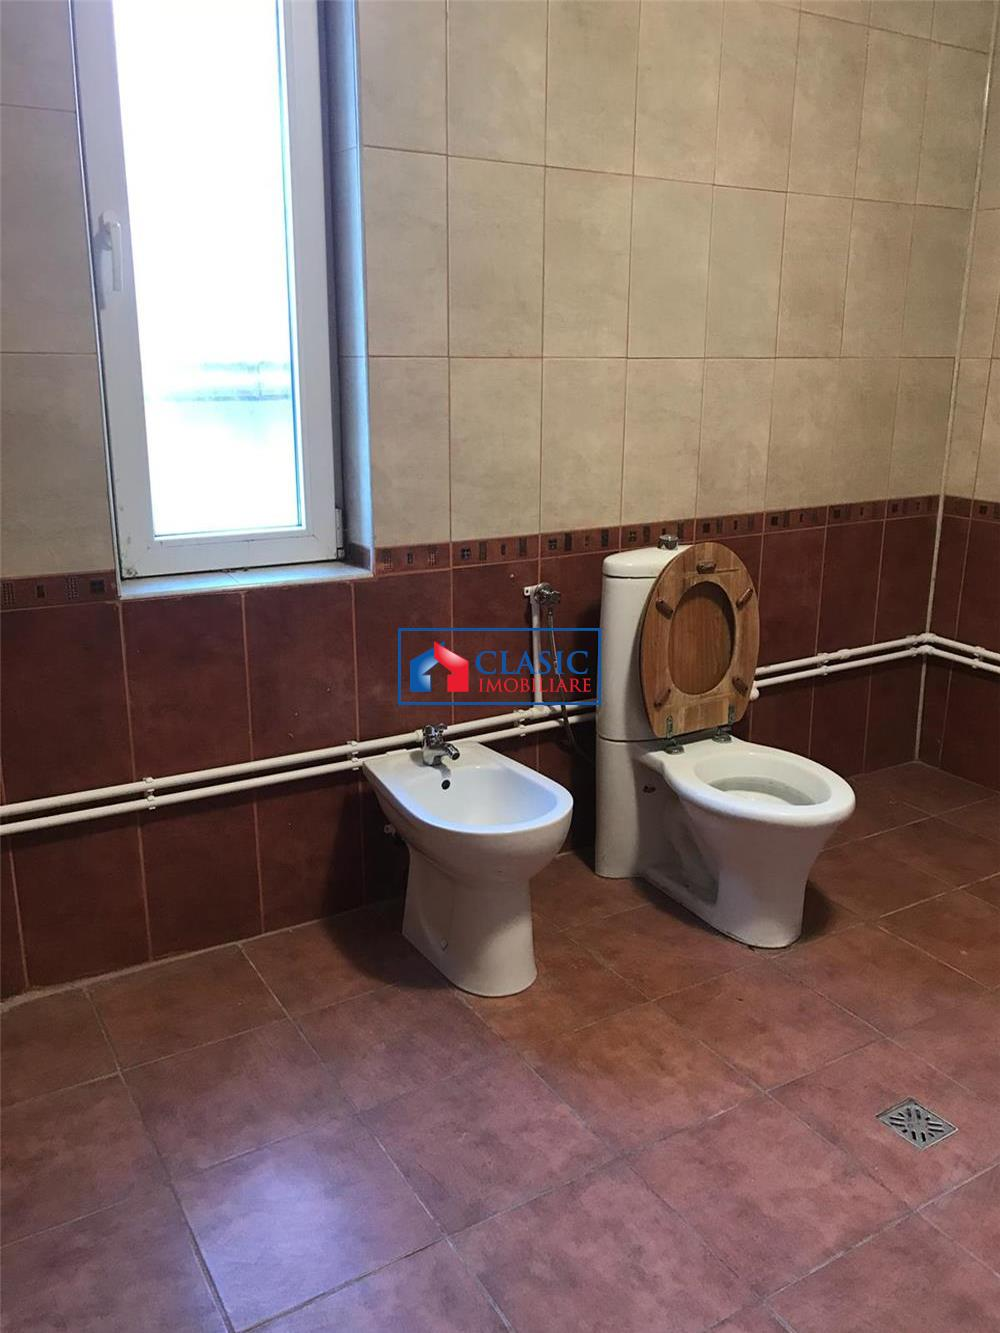 Inchiriere spatiu birouri zona Buna Ziua, 20 de parcari, Cluj Napoca